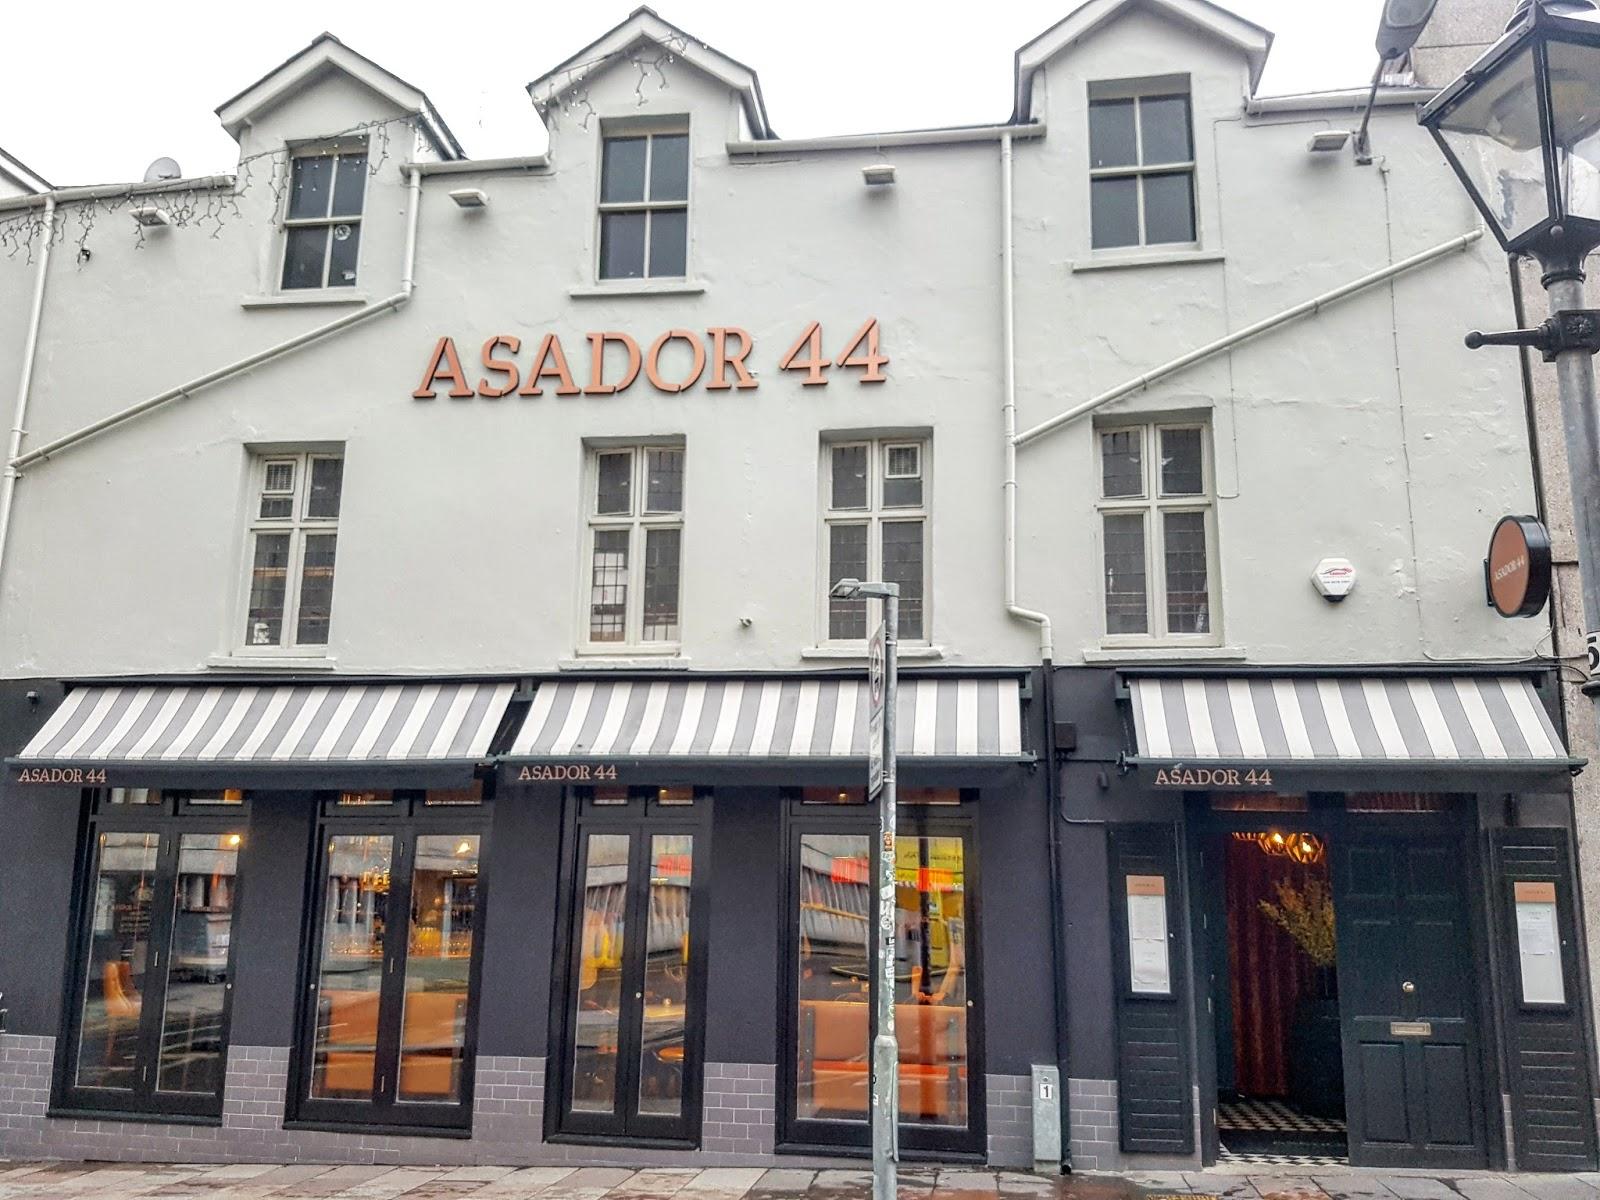 GourmetGorro: Asador 44, Cardiff Spanish restaurant review